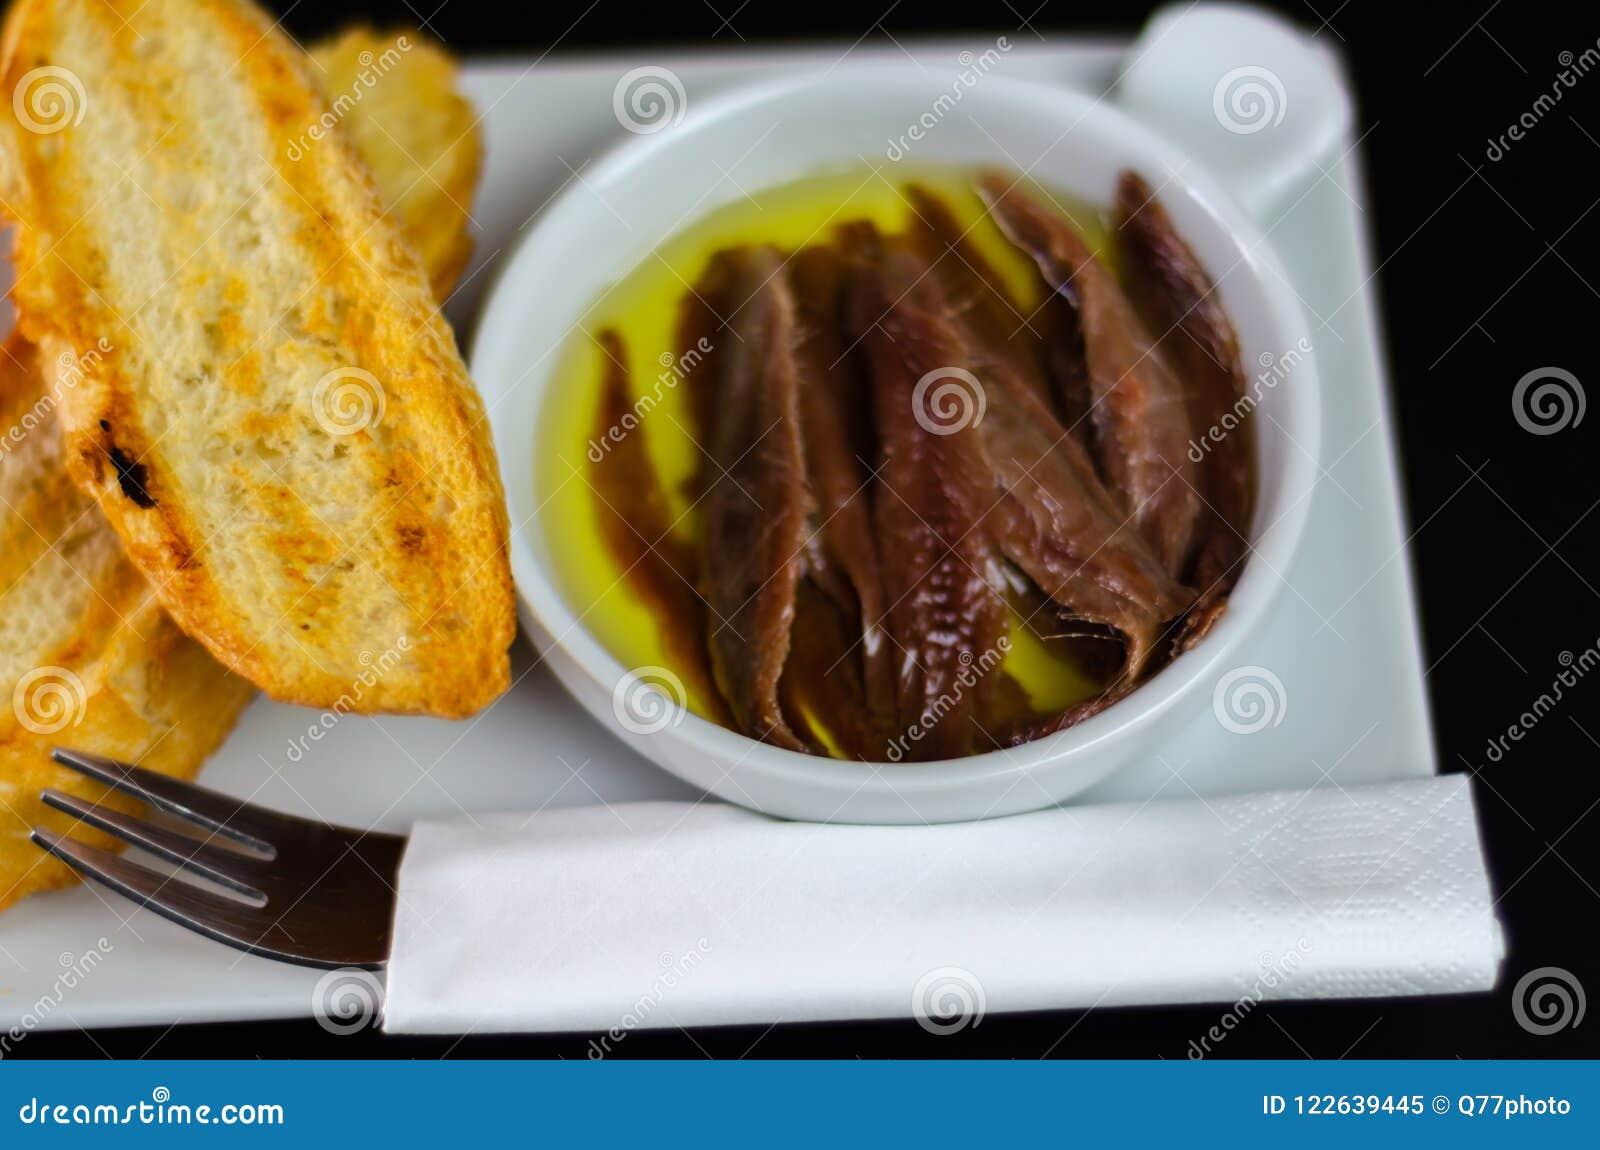 delicious spanish snack fresh fish marinated in olive oil serv